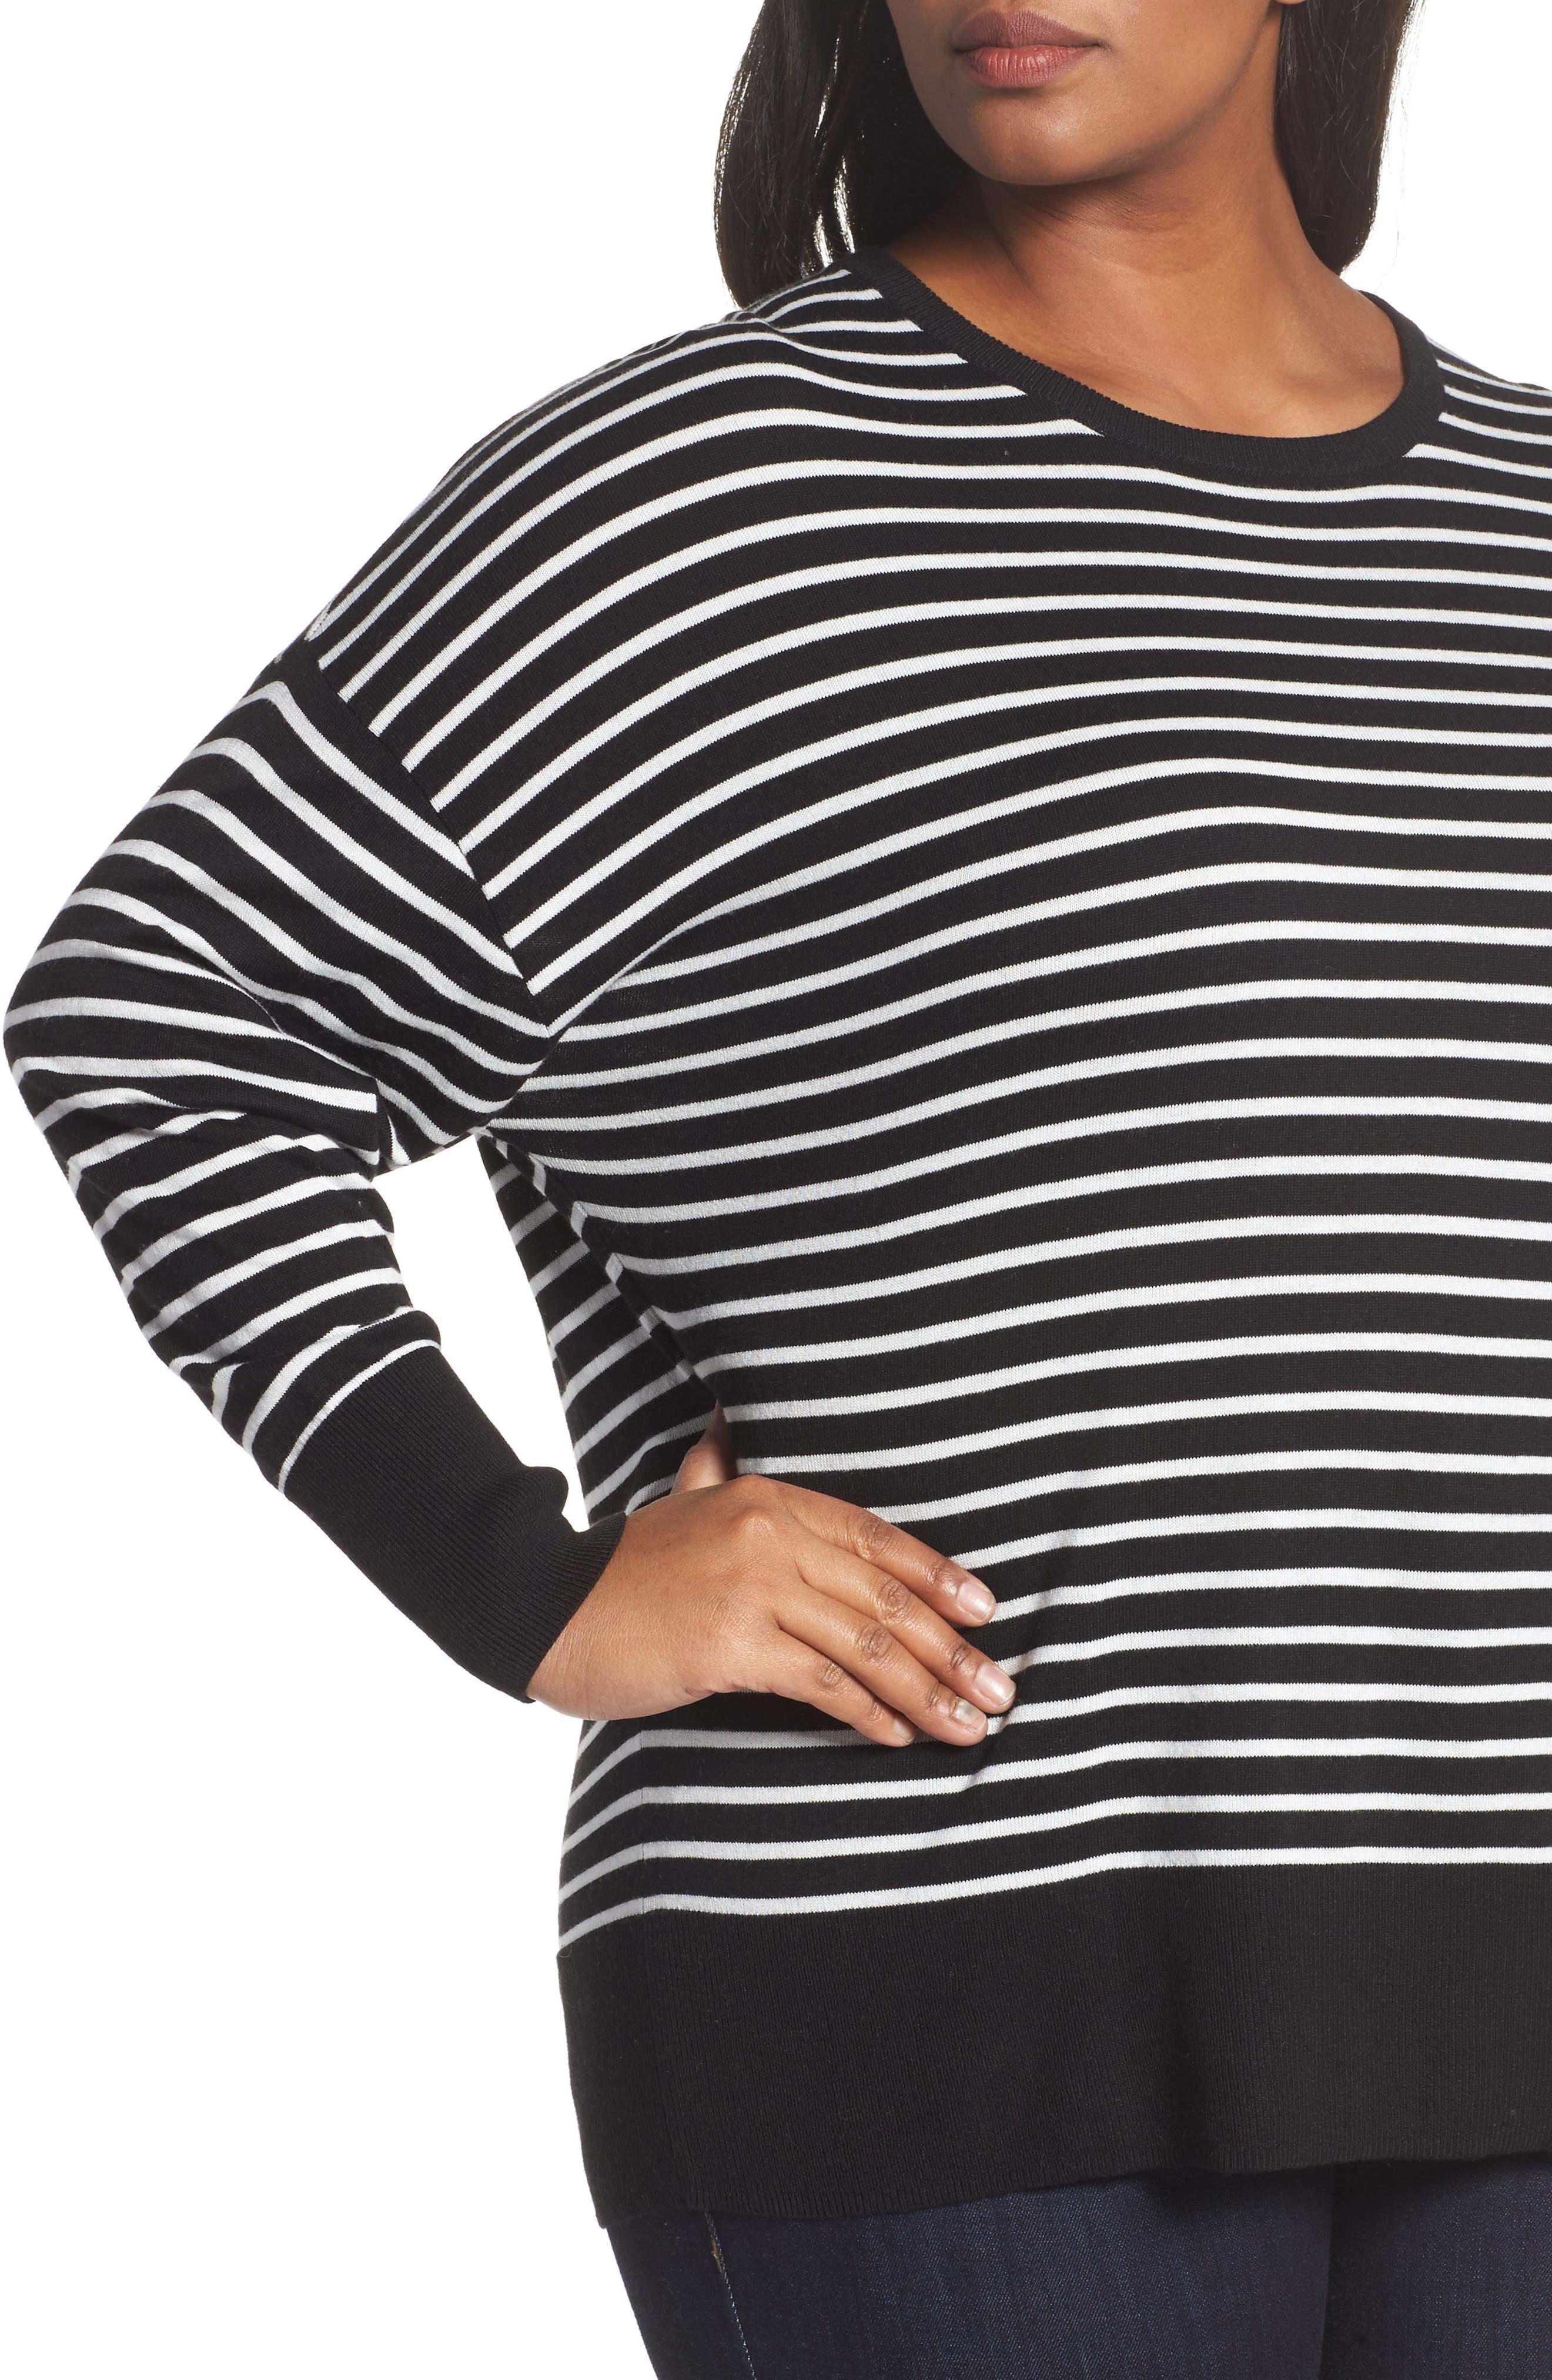 Dolman Sleeve Crewneck Sweater,                             Alternate thumbnail 4, color,                             002